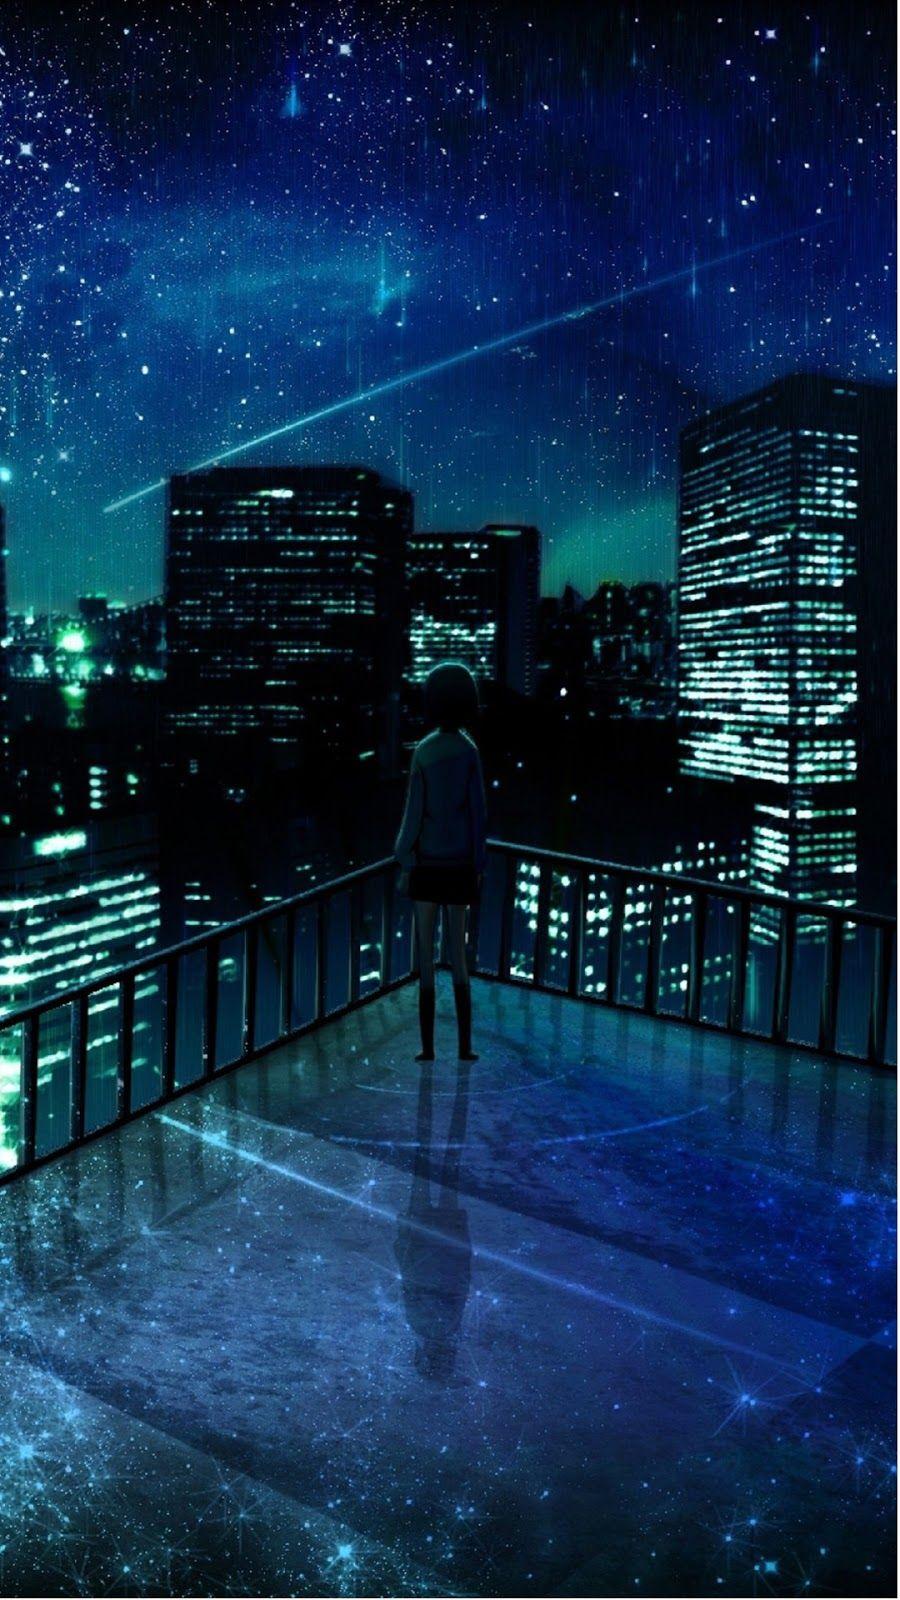 Bintang Gambar Animasi Google Play Store Revenue Download Anime City Anime Scenery Wallpaper Anime Galaxy